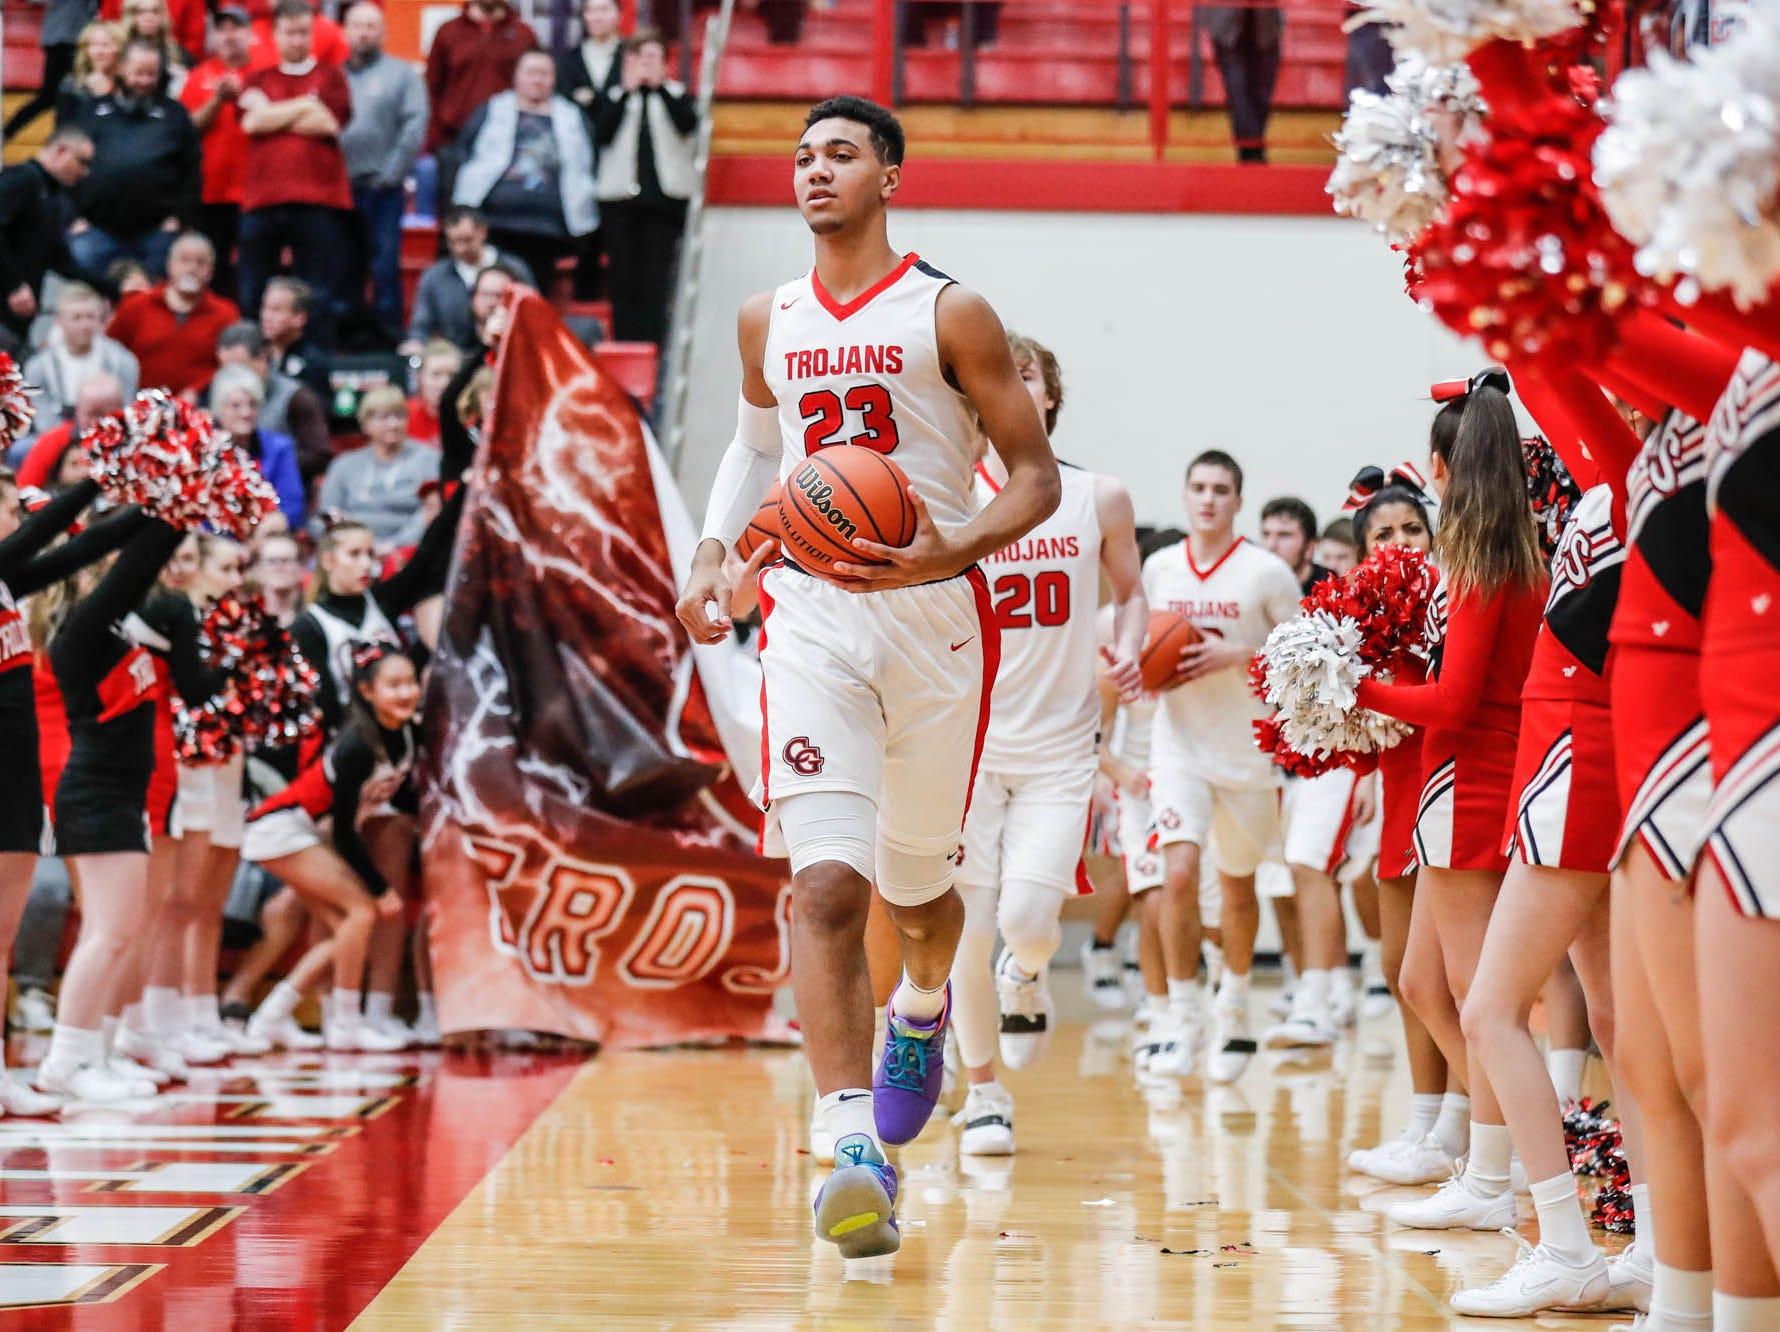 Center Grove High School's forward Trayce Jackson-Davis (23) leads the team on top the court during a game between Center Grove High School and Carmel High School, held at Center Grove on on Friday, Jan. 4, 2019.